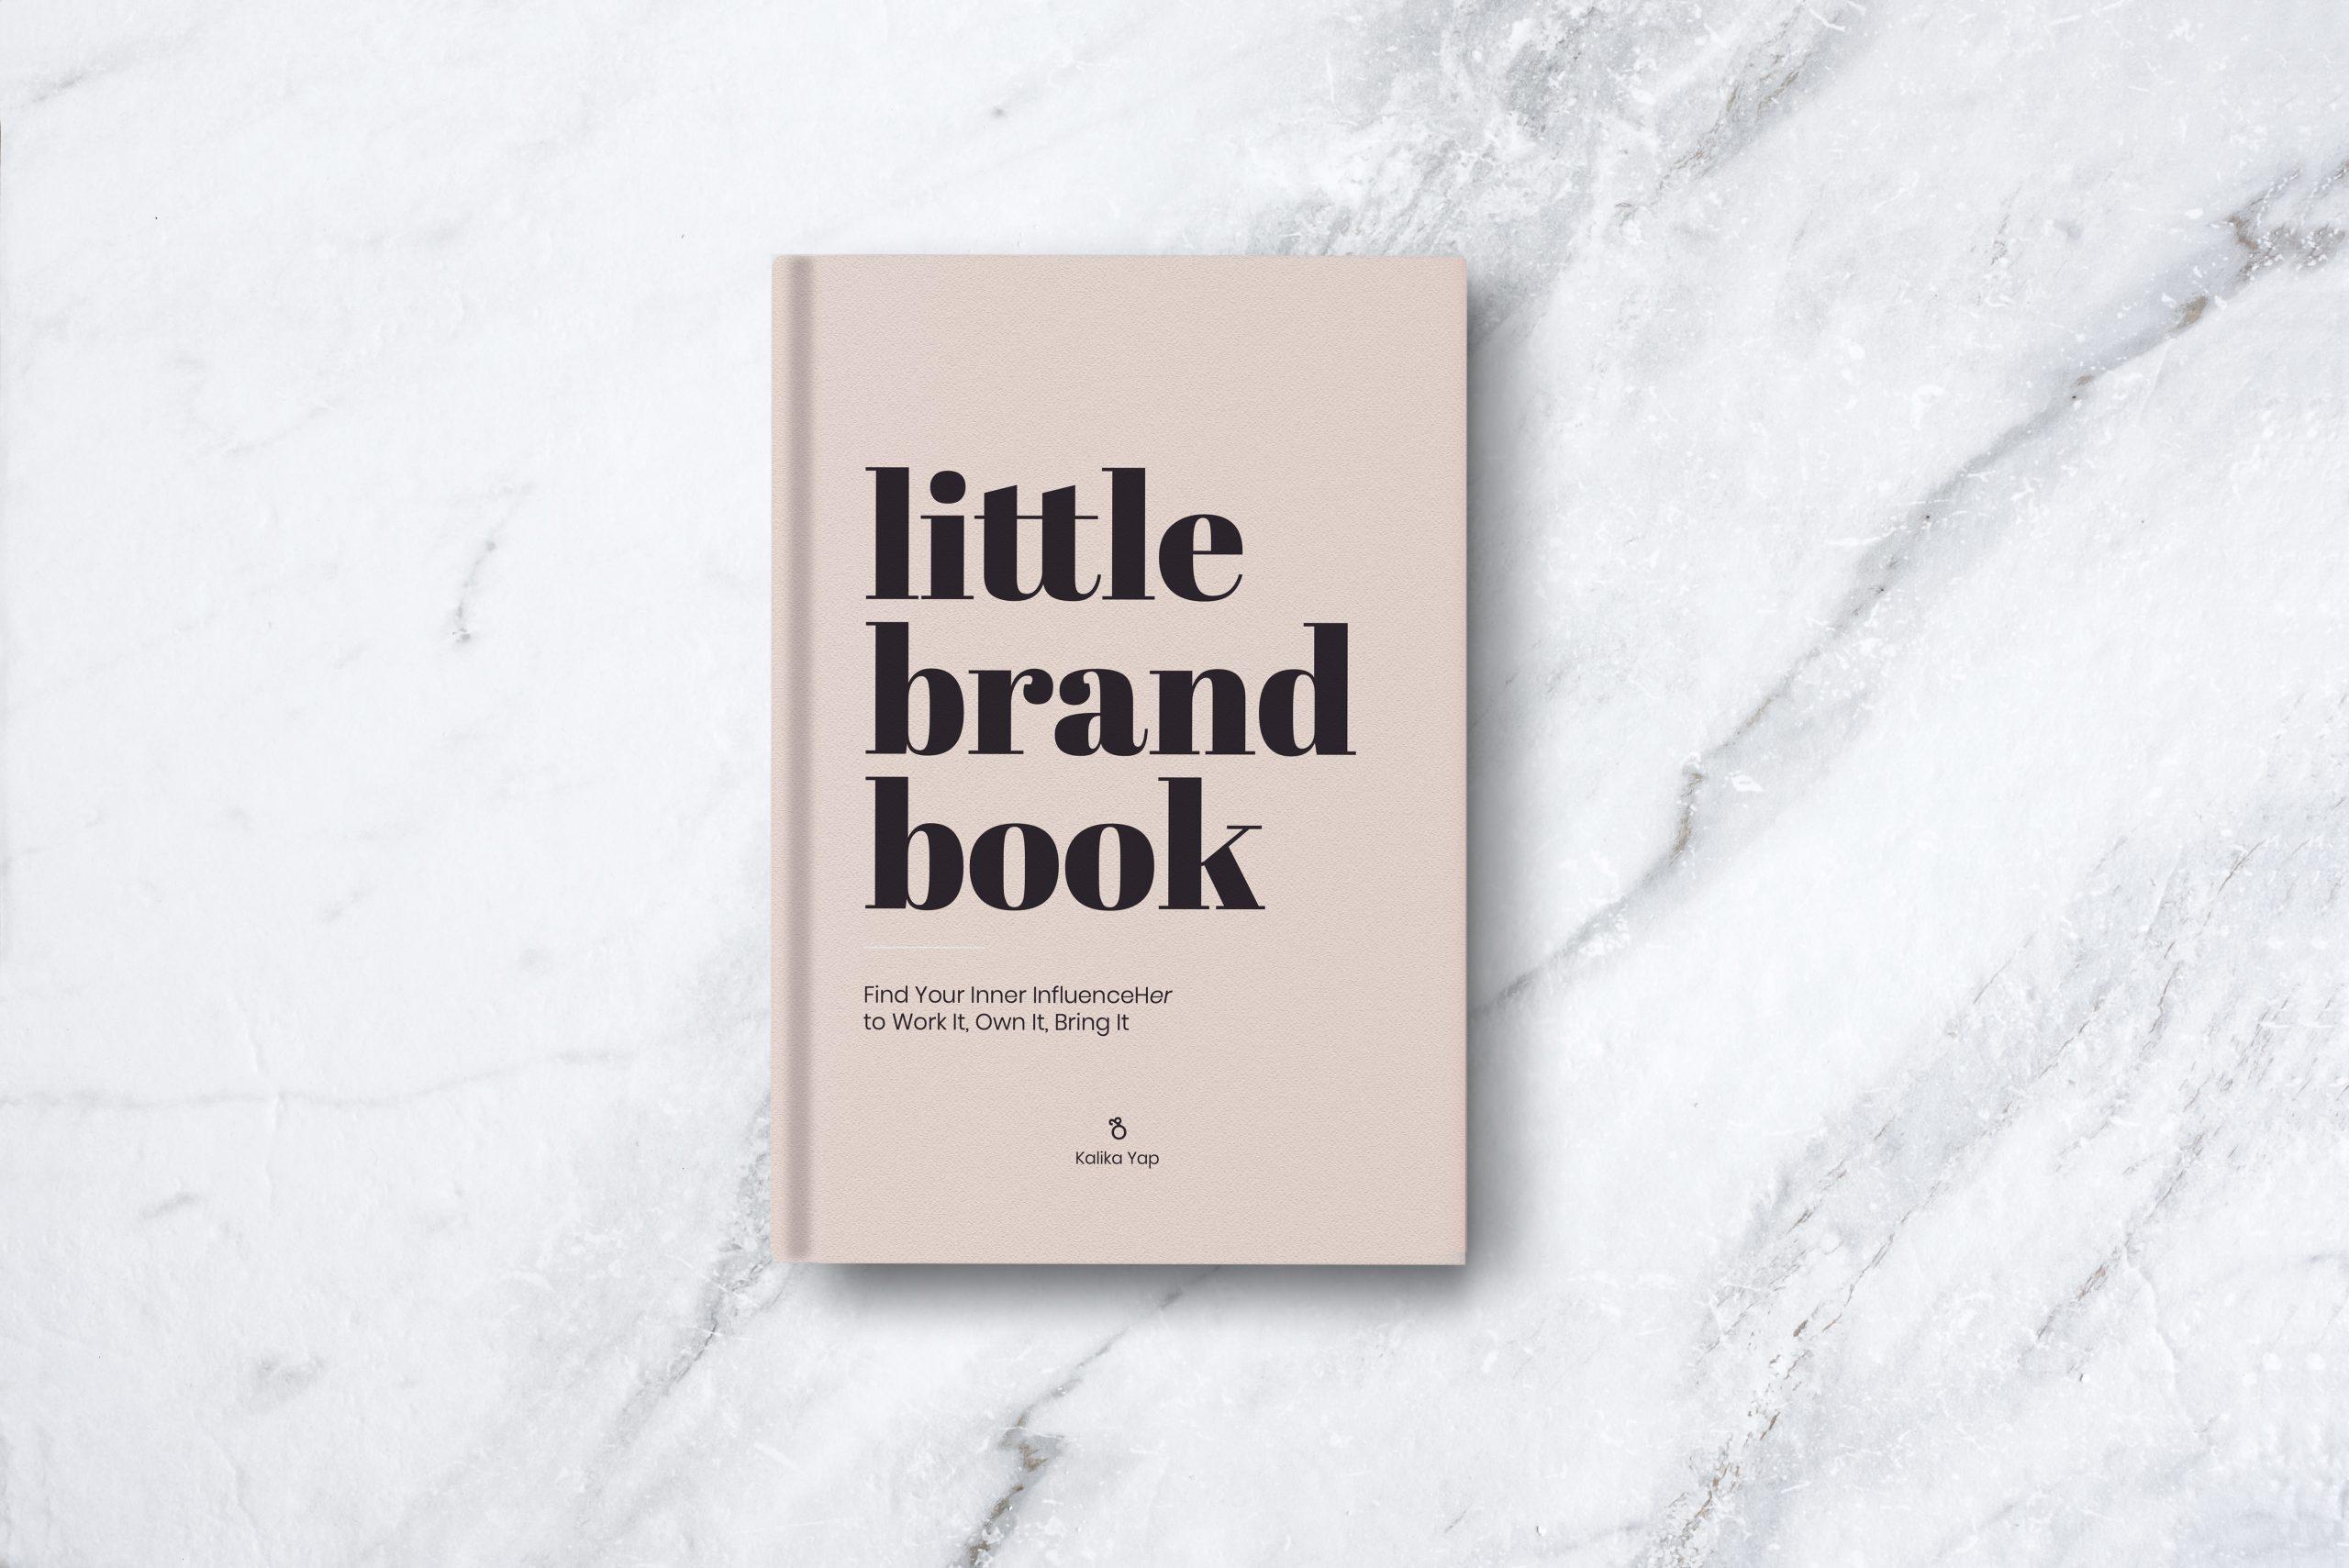 Kalika Yap's Little brand book actual image on table